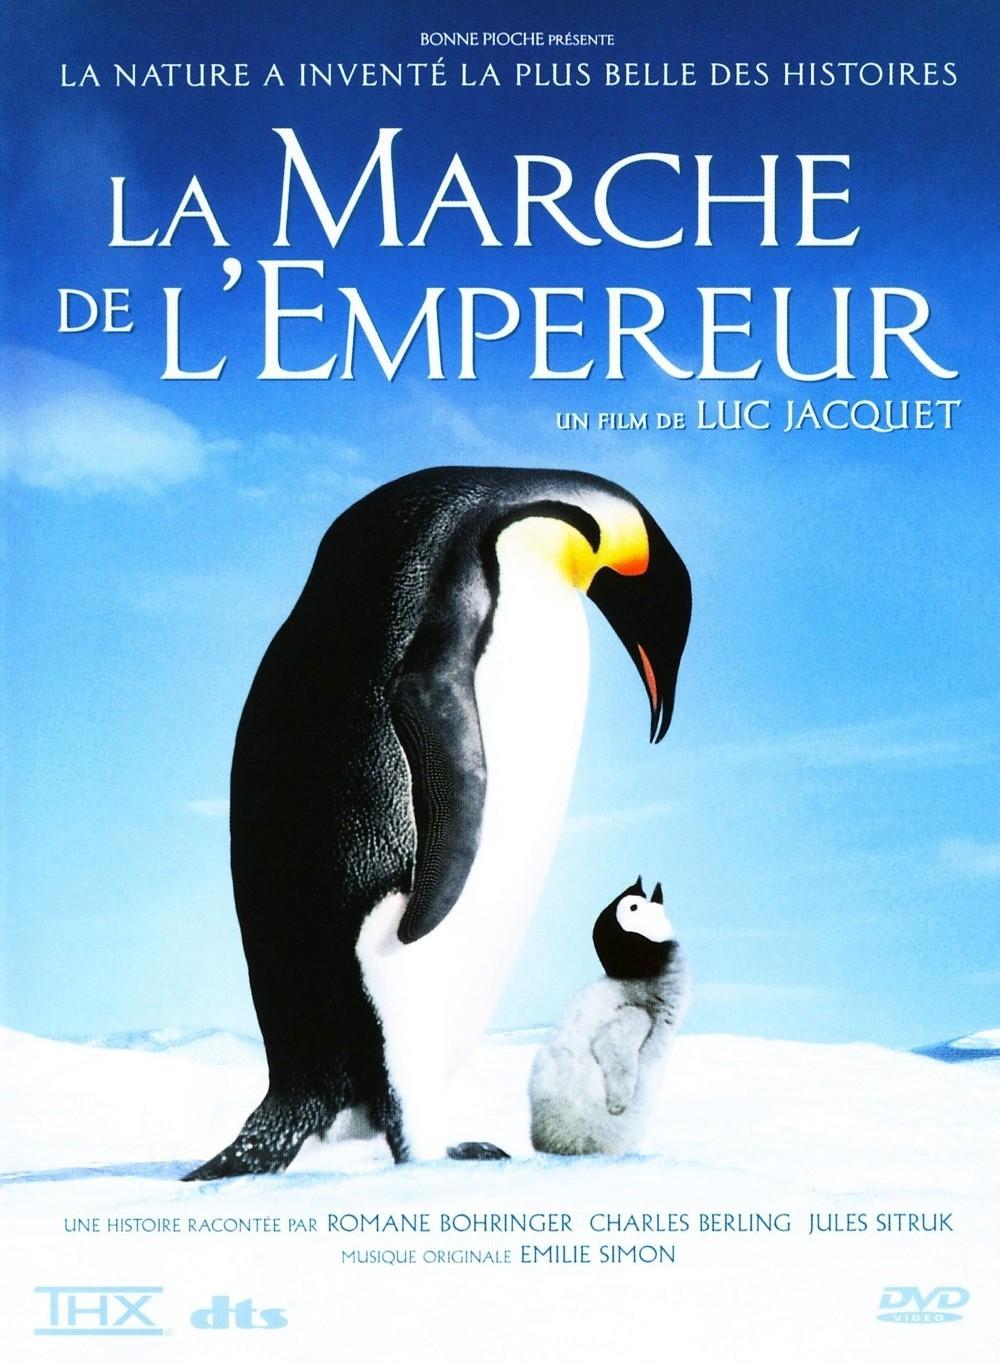 La_Marche_de_l_empereur.jpg